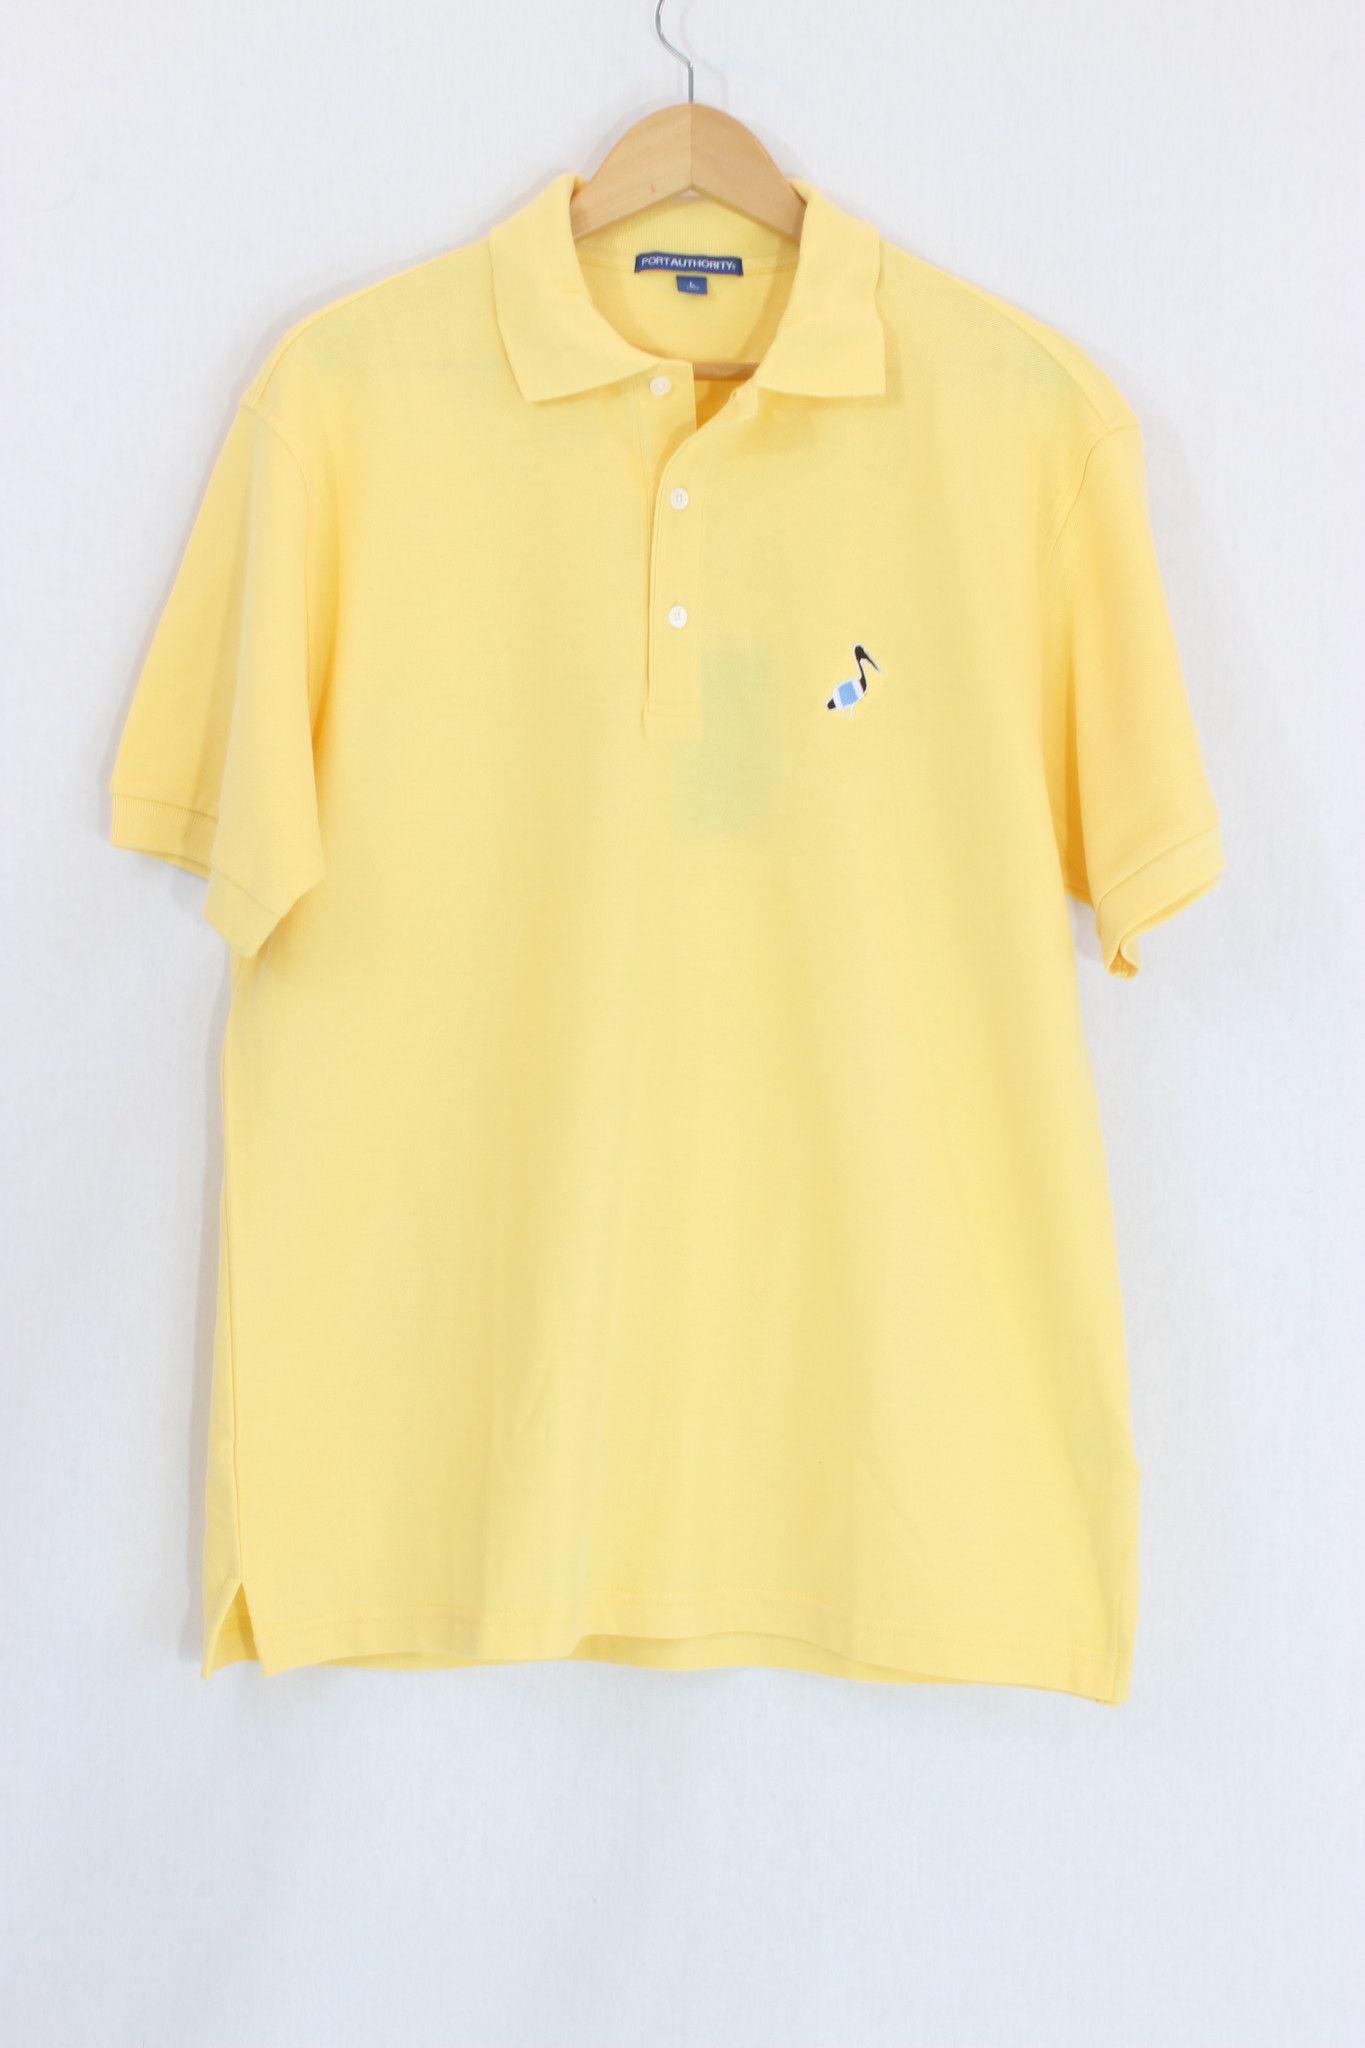 Pelican Logo Polo Shirt Polo Shirt Polo Polo Shirt Shirts